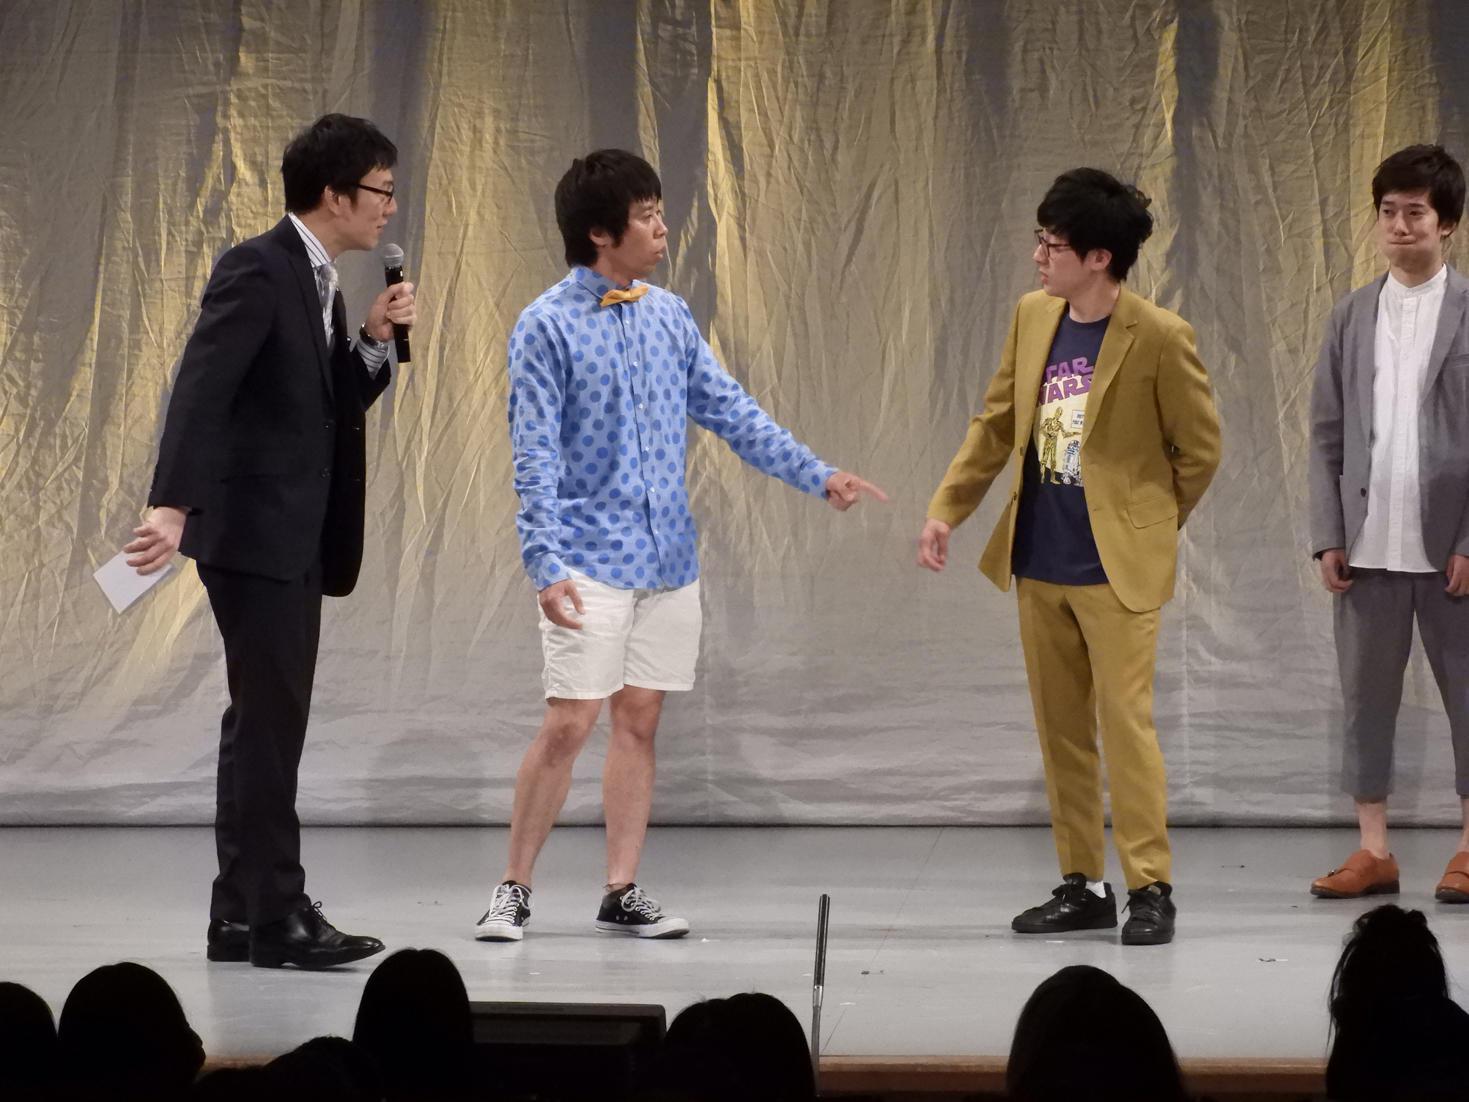 http://news.yoshimoto.co.jp/20180406112455-de84262dc4f2598bdc72043fc9a63280313165fa.jpg